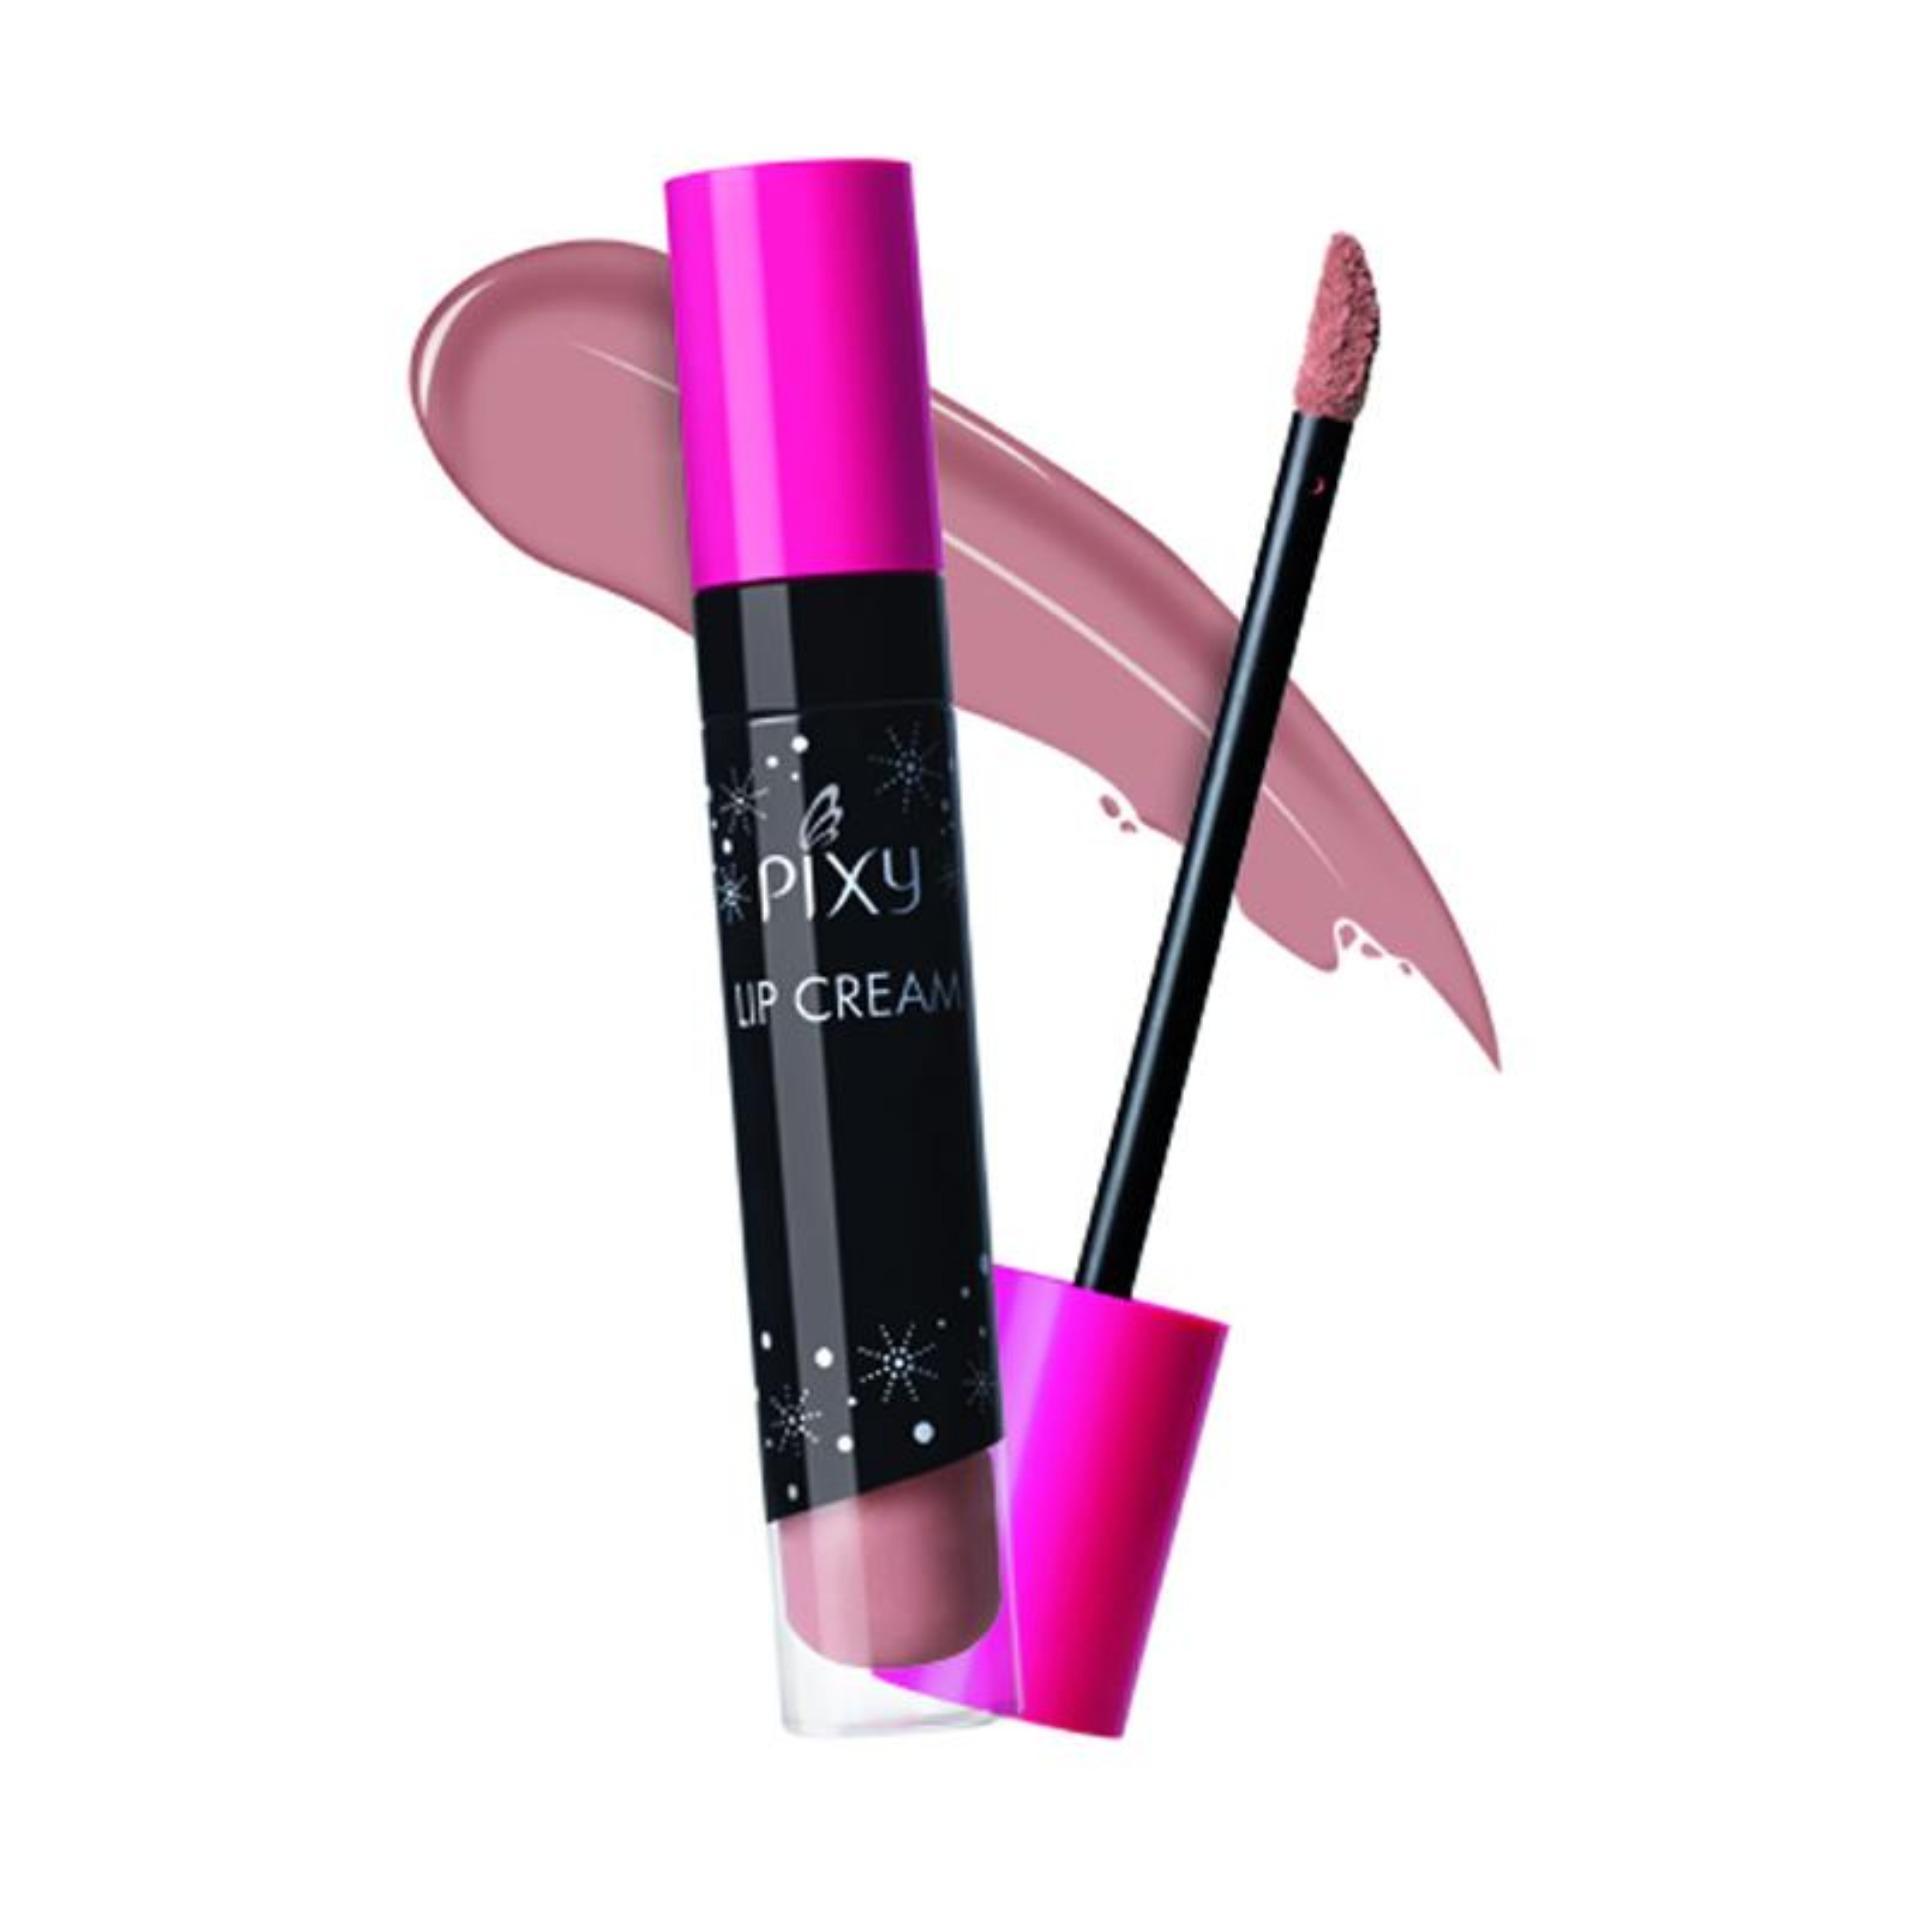 Pixy Lip Cream 08 Delicate Pink